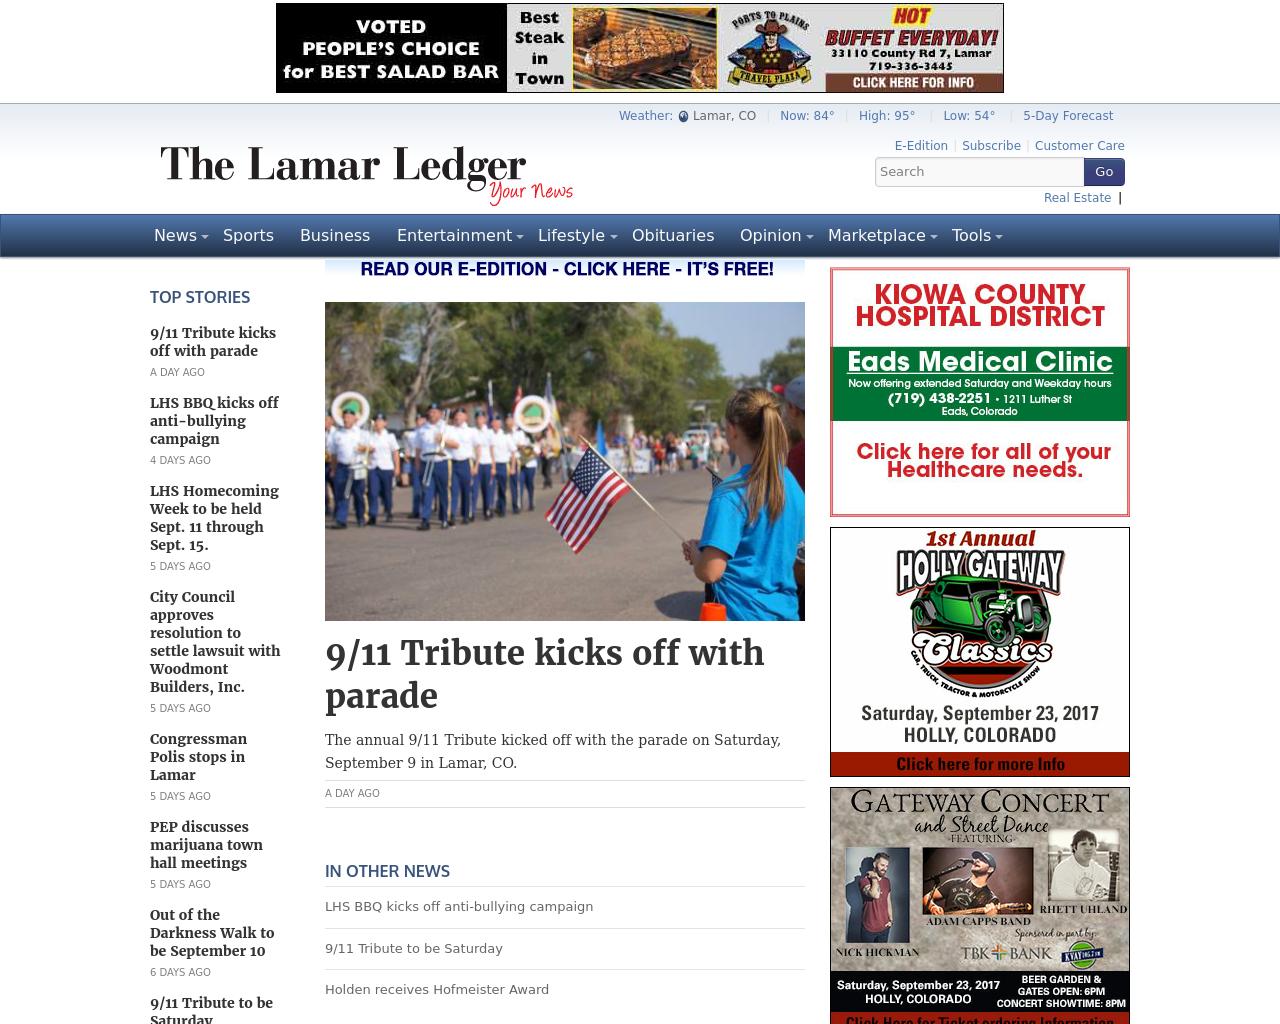 Lamar-Ledger-Advertising-Reviews-Pricing